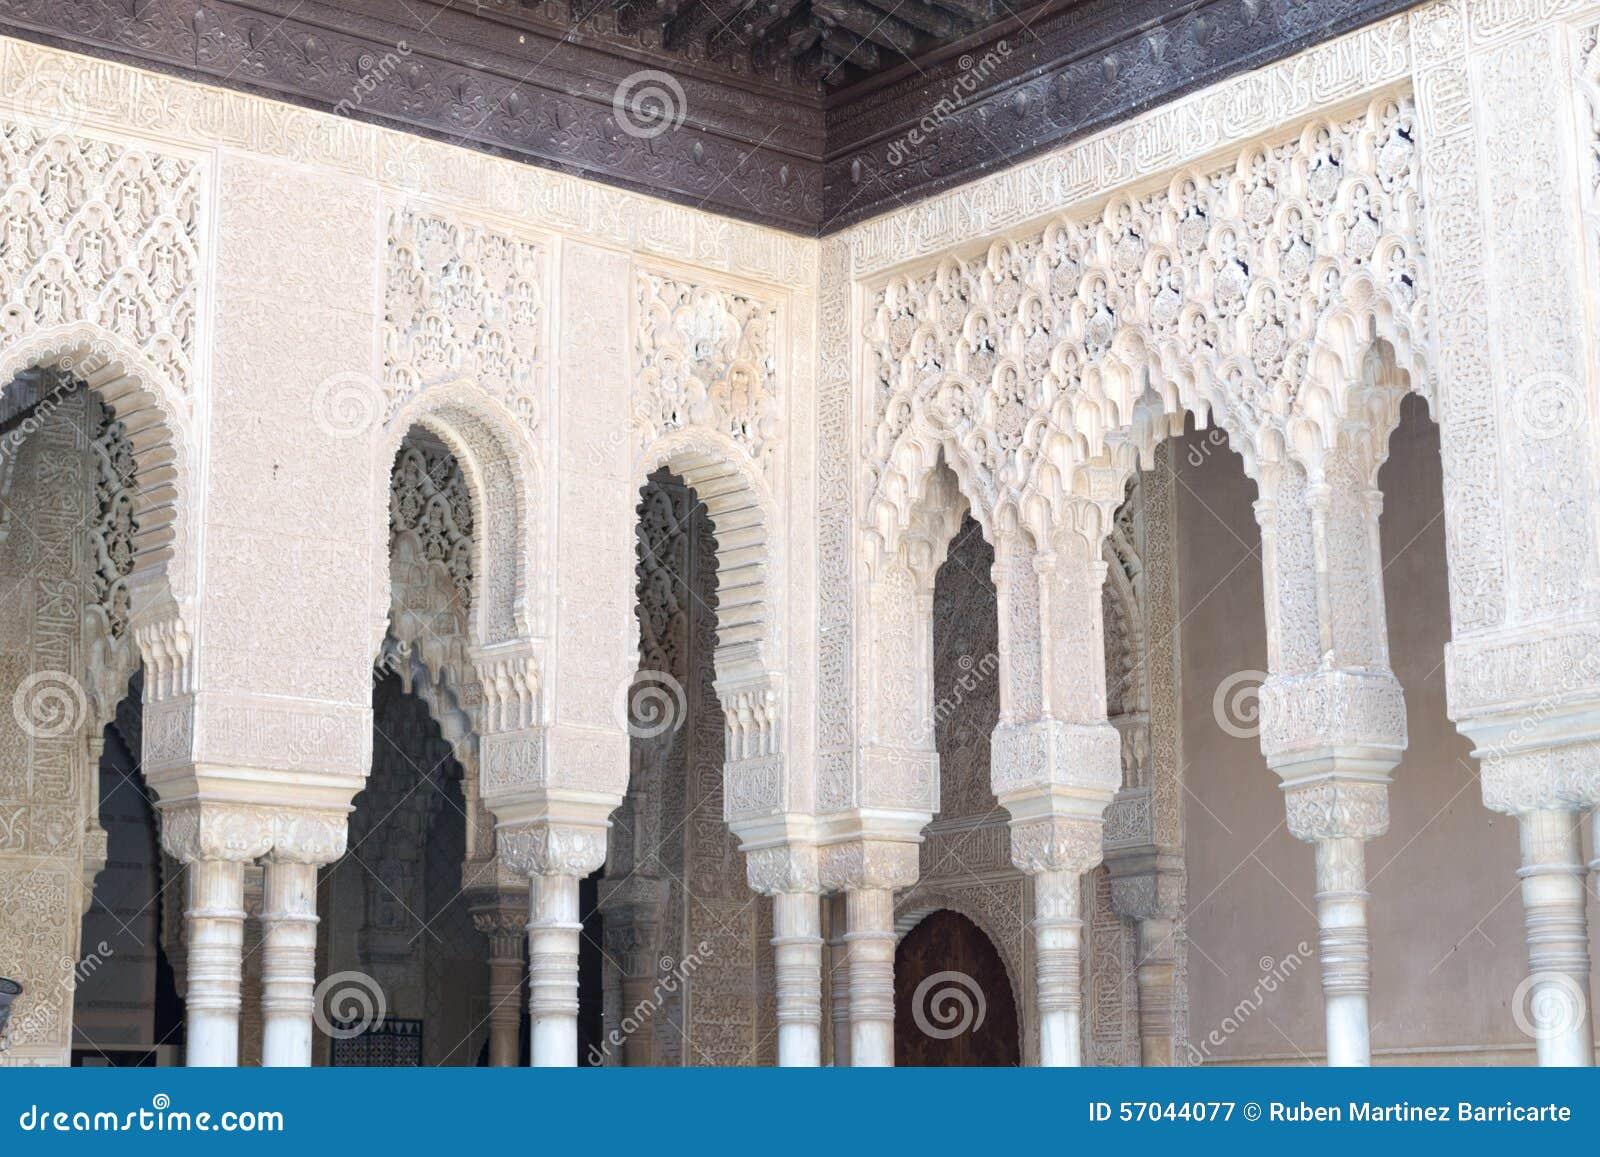 arabesque arches and pillars - photo #19